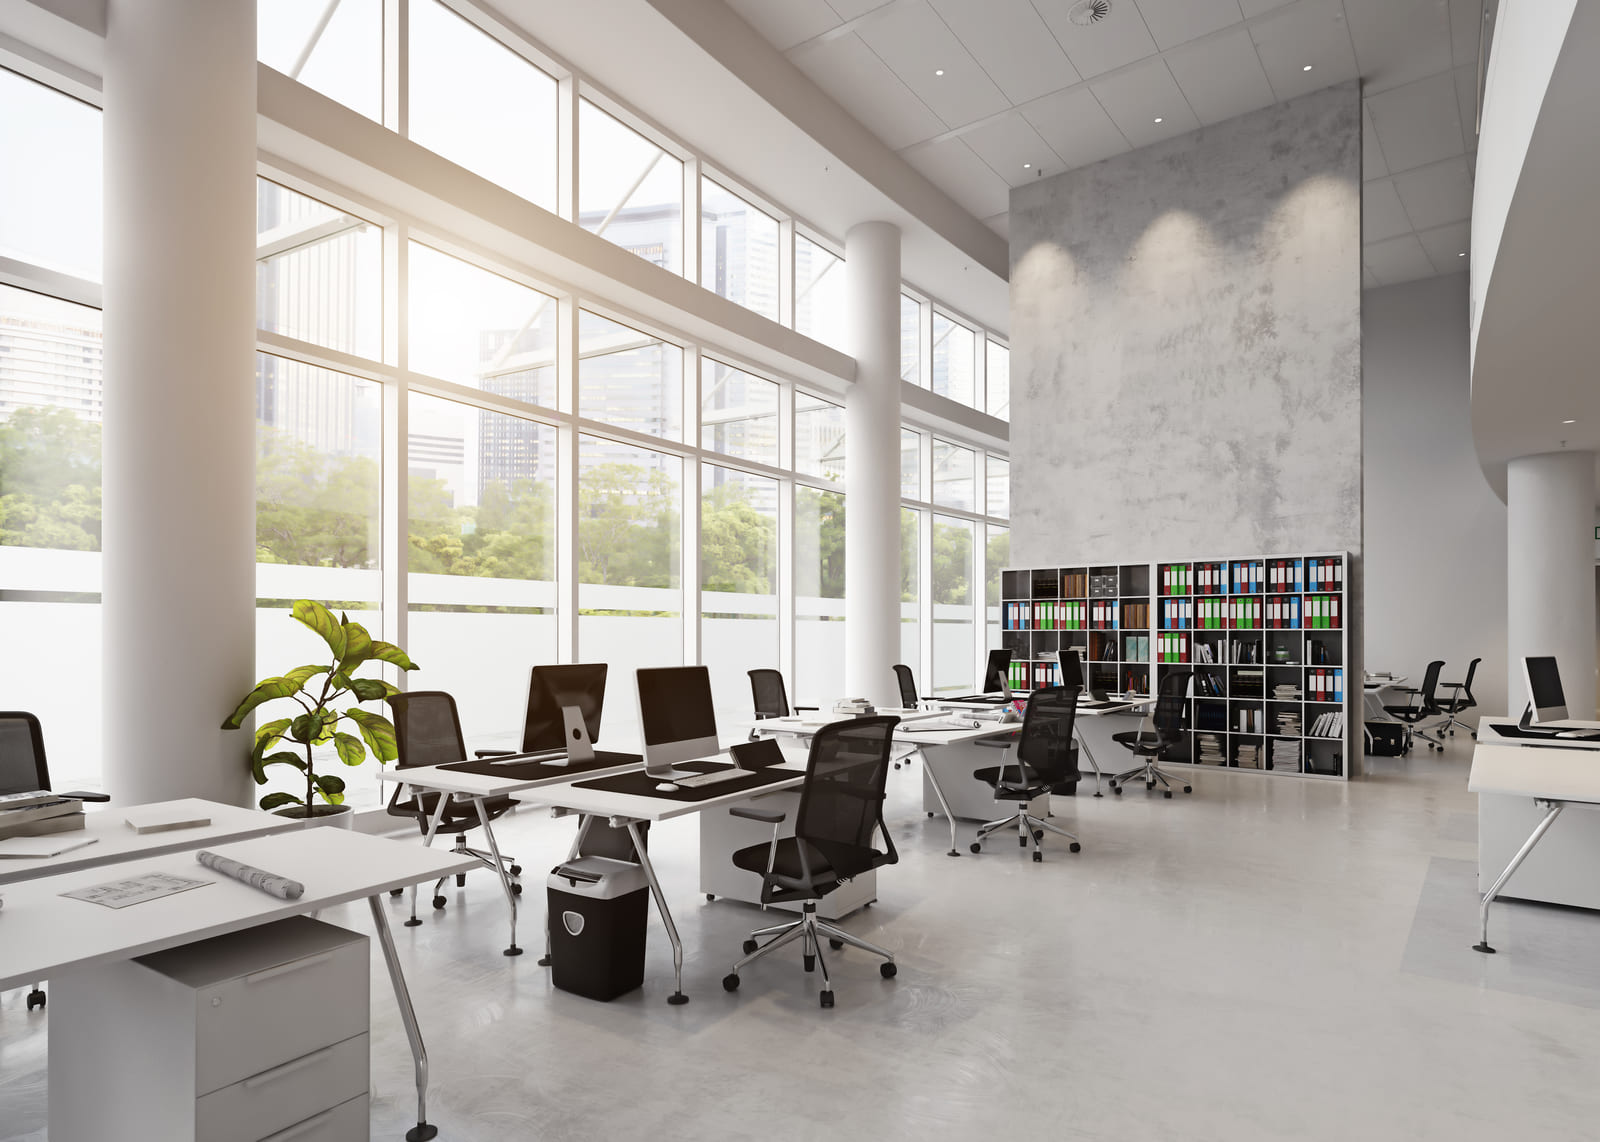 Office design of the future